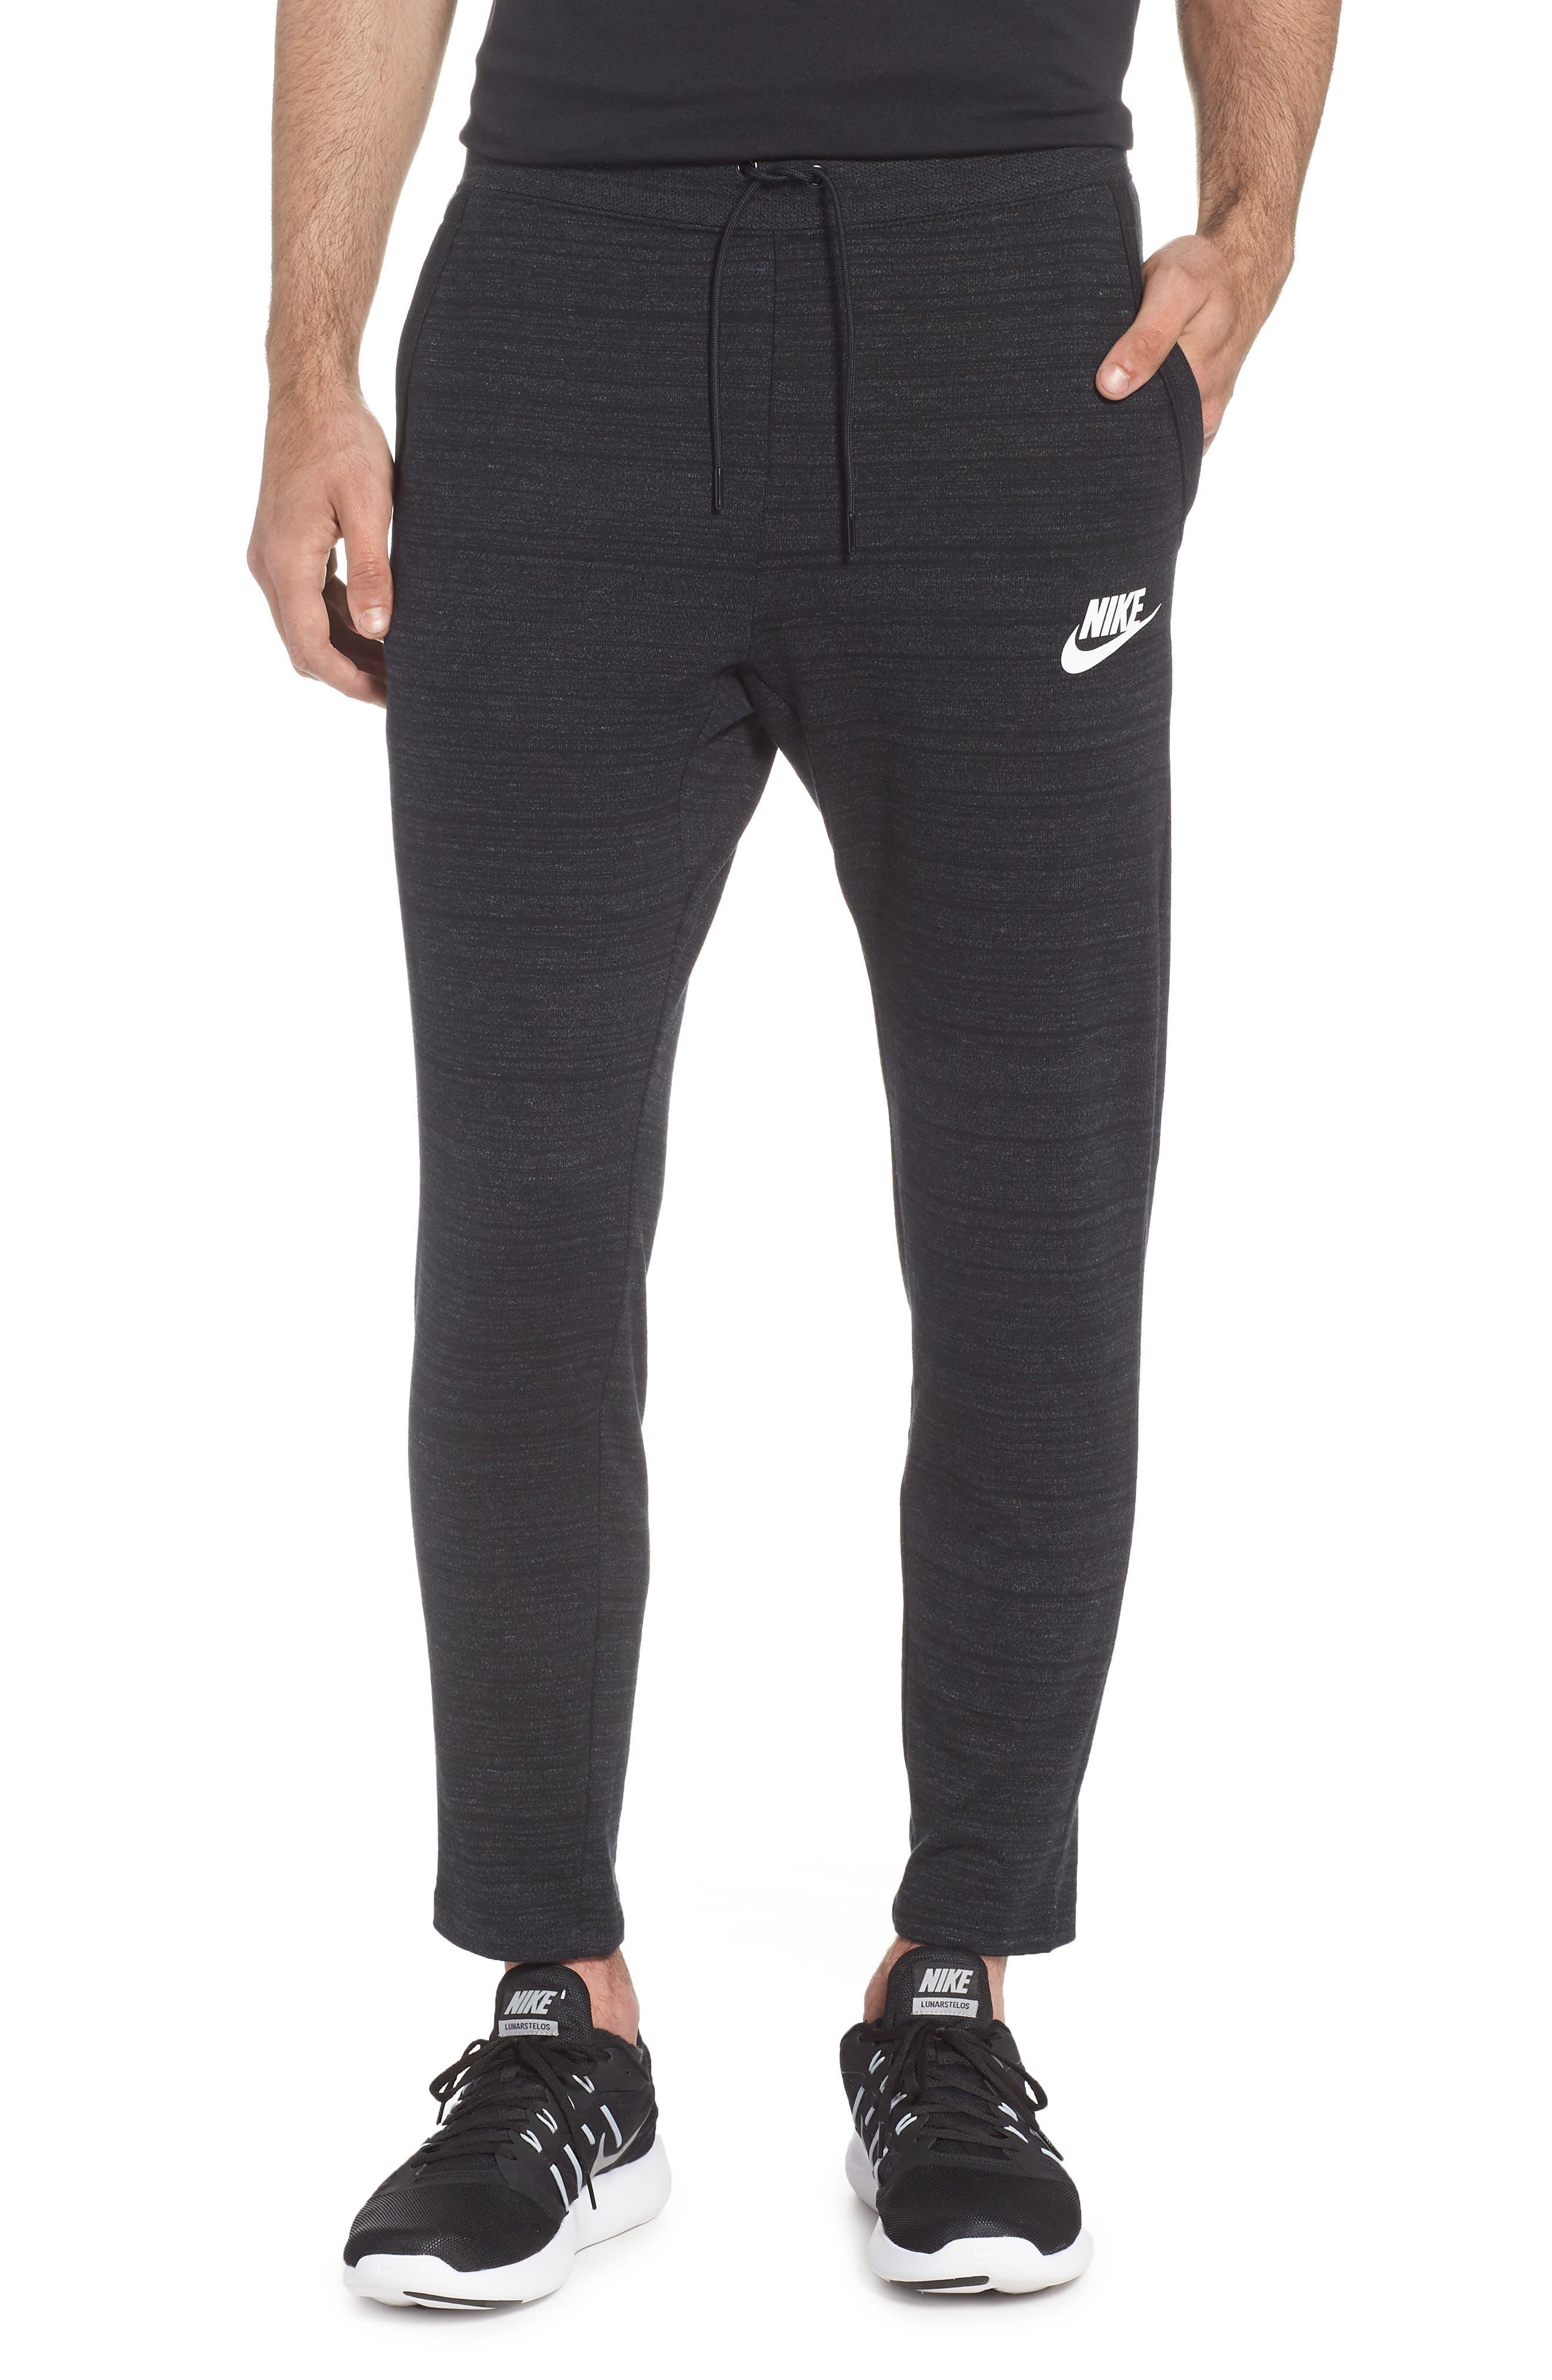 NSW Advance 15 Jogger Pants,                             Main thumbnail 1, color,                             BLACK/ HEATHER/ WHITE